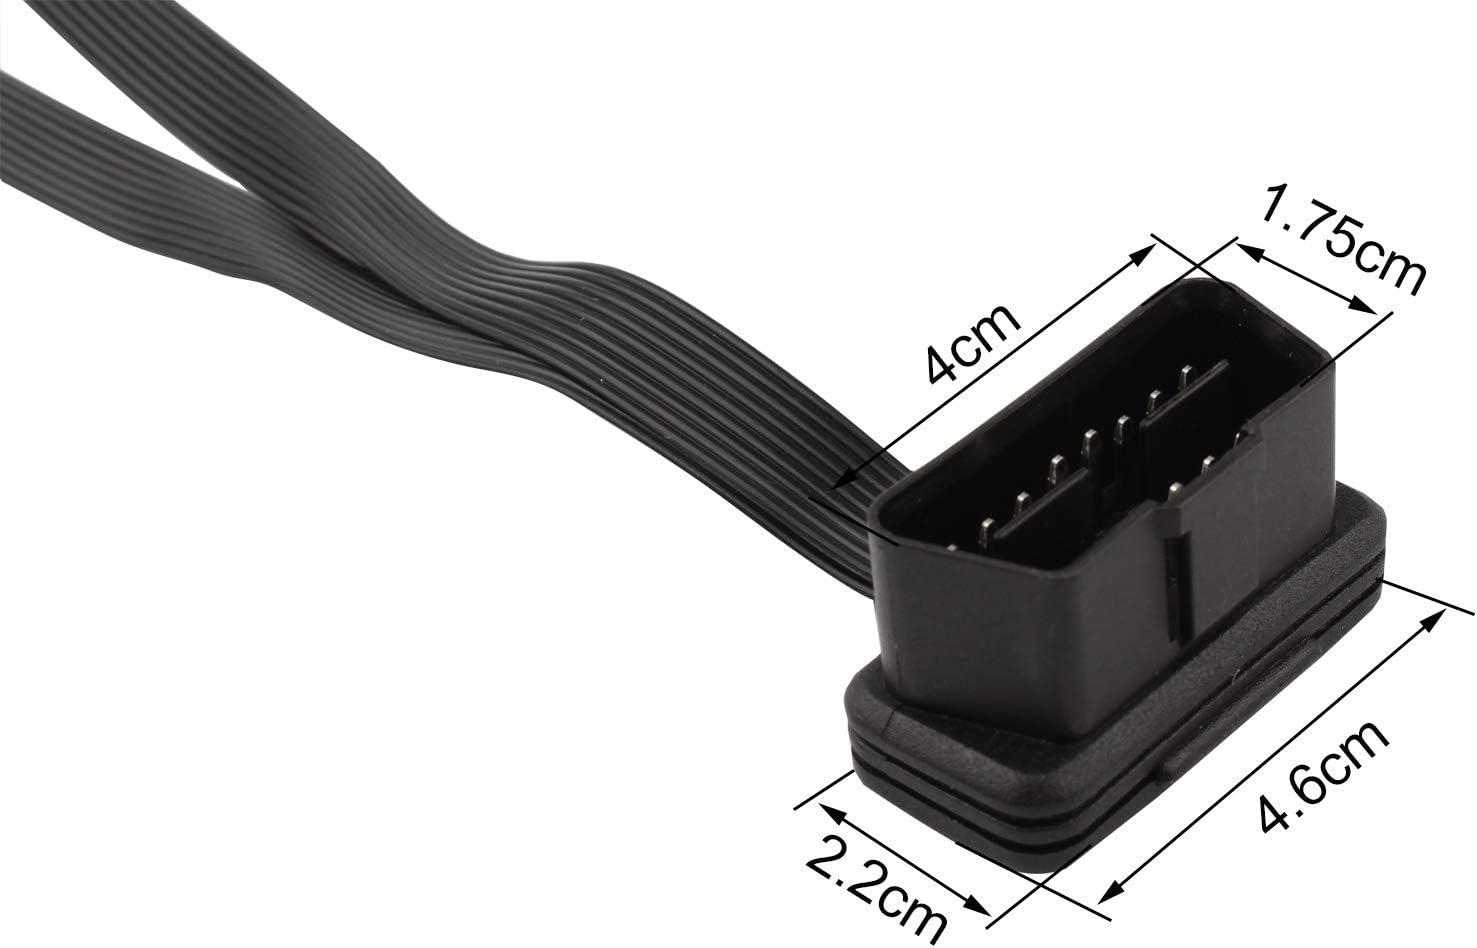 Adaptador de 16 Pines 1 Macho a 2 Hembra Cable Extensor de diagn/óstico OBD2 para Coche Cable Plano de 30 cm Cable Divisor de Perfil Ultra bajo OBD-II y Ultrafino Futheda